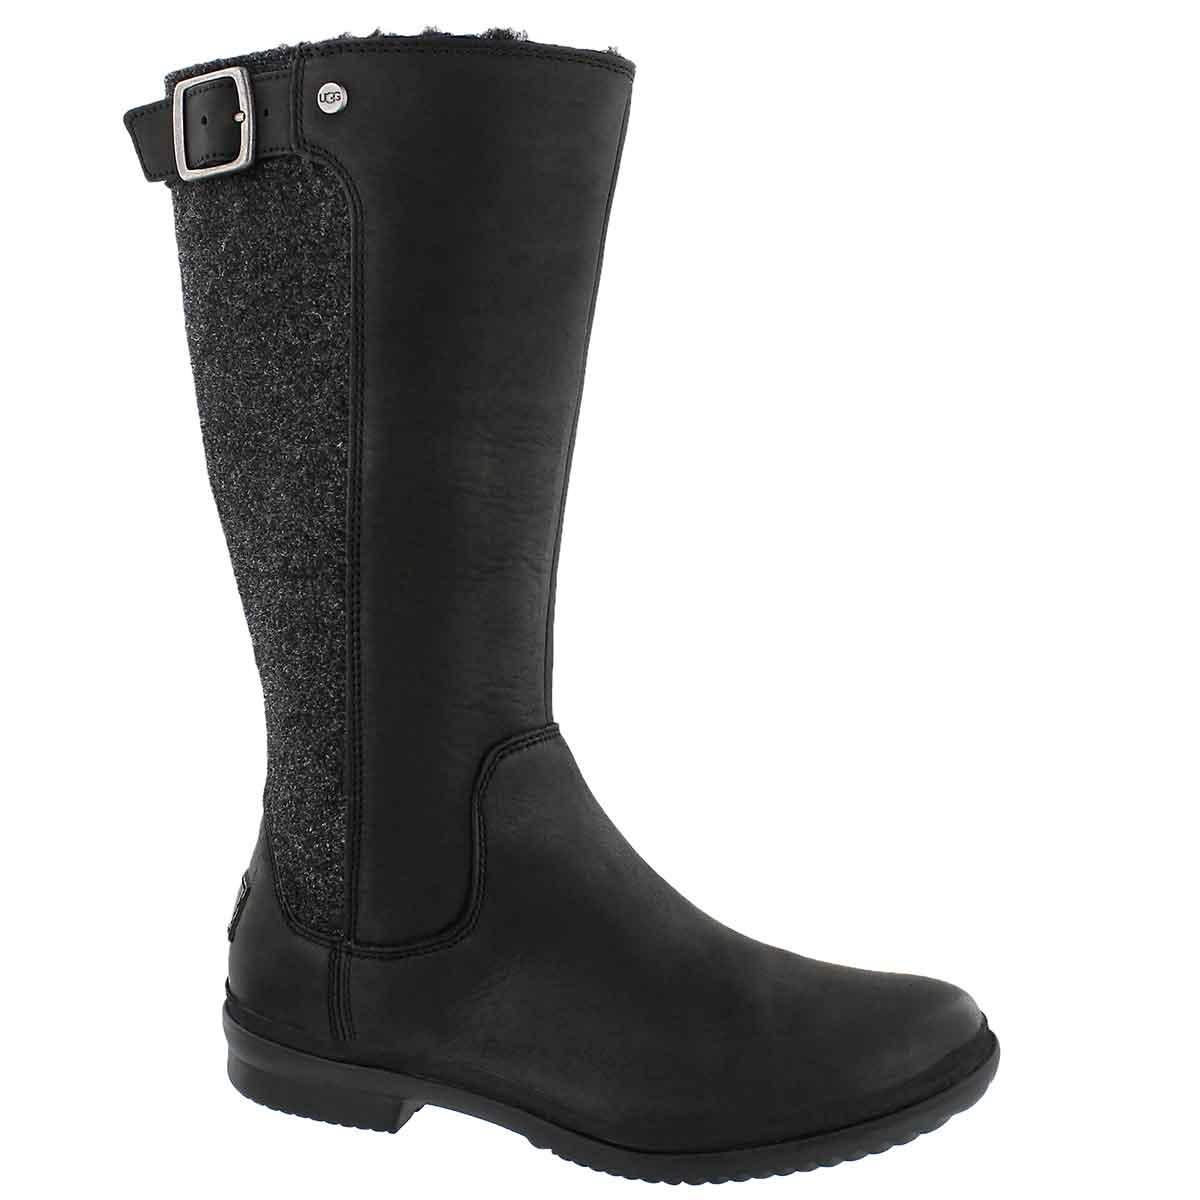 Women's JANINA black wtpf knee high boots